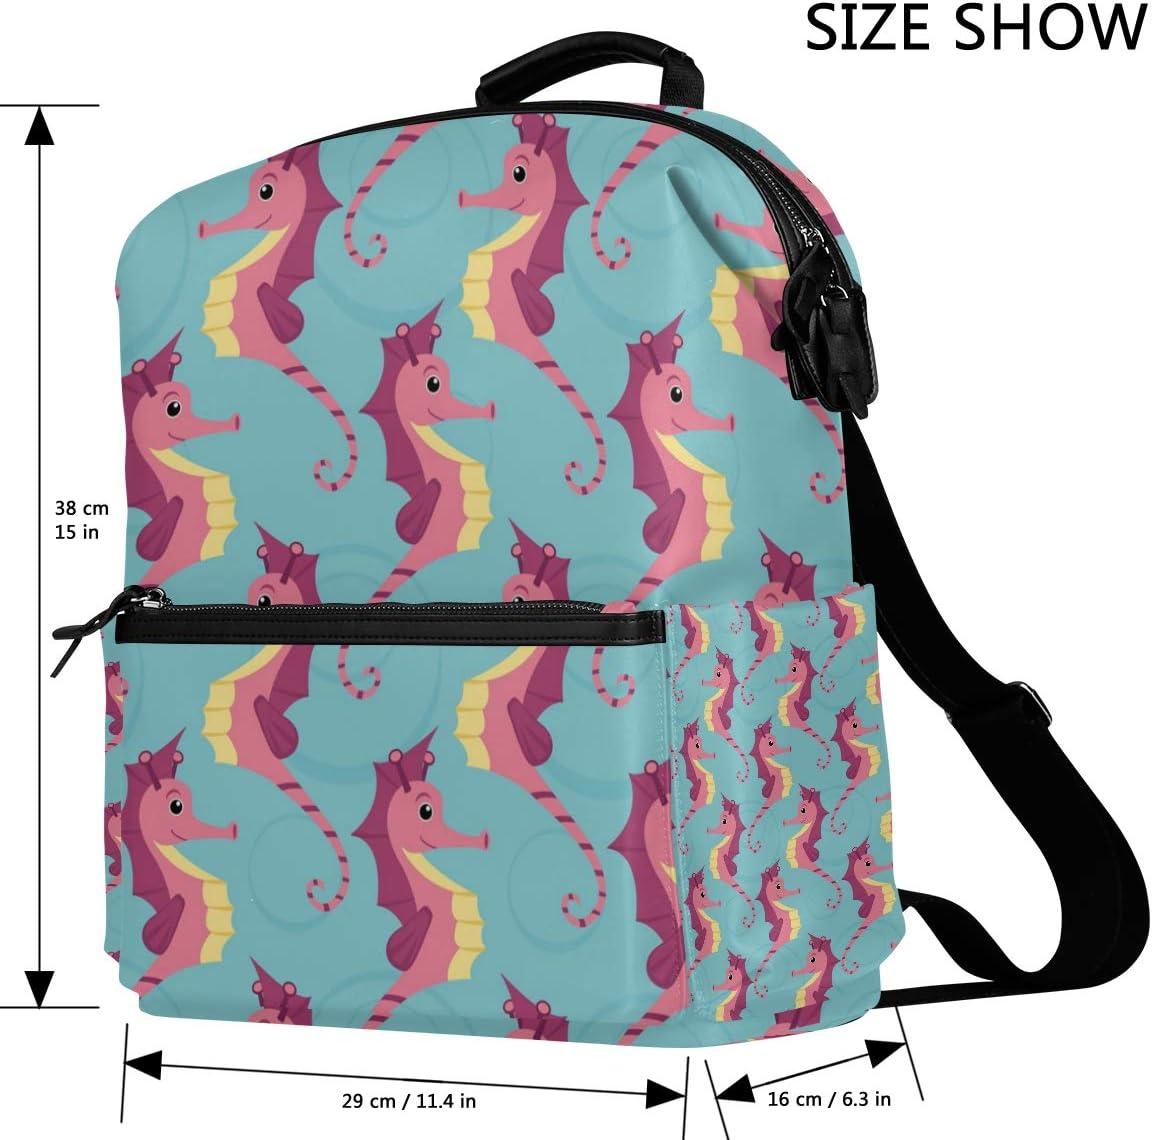 Cute Sea Hippocampus Backpack for Women Men Girl Boy Daypack Fashion Laptop Backpack School College Hiking Travel Bag Bookbag Schoolbag